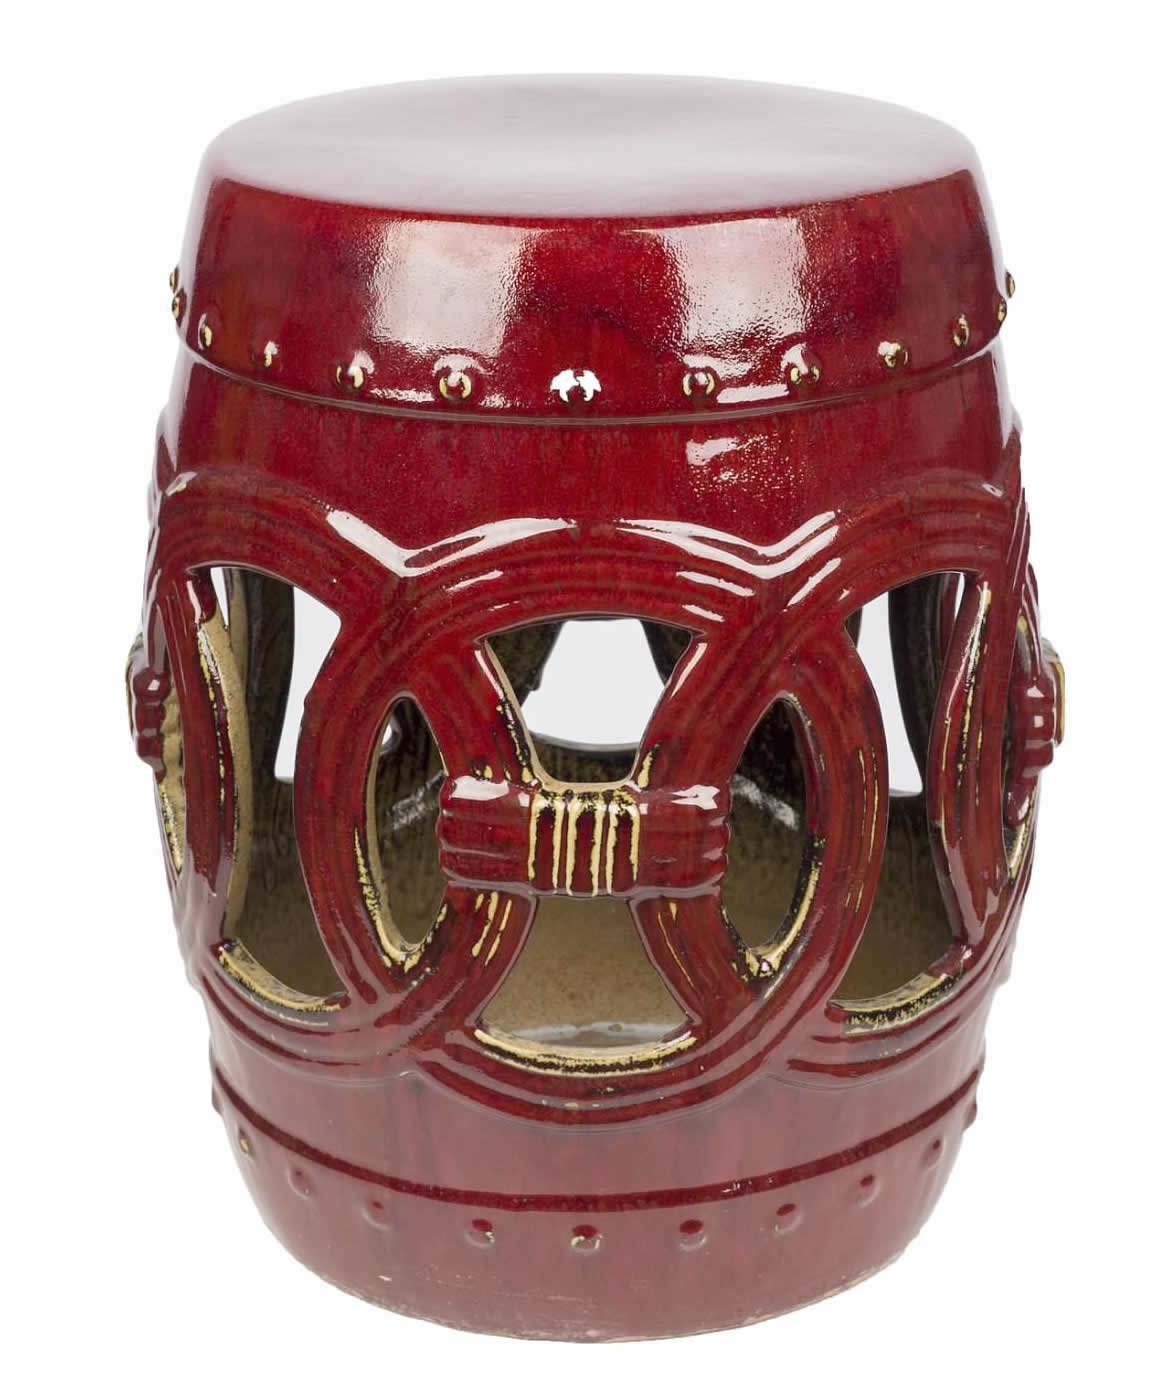 Abbyson Ellie Ceramic Garden Stool, Red